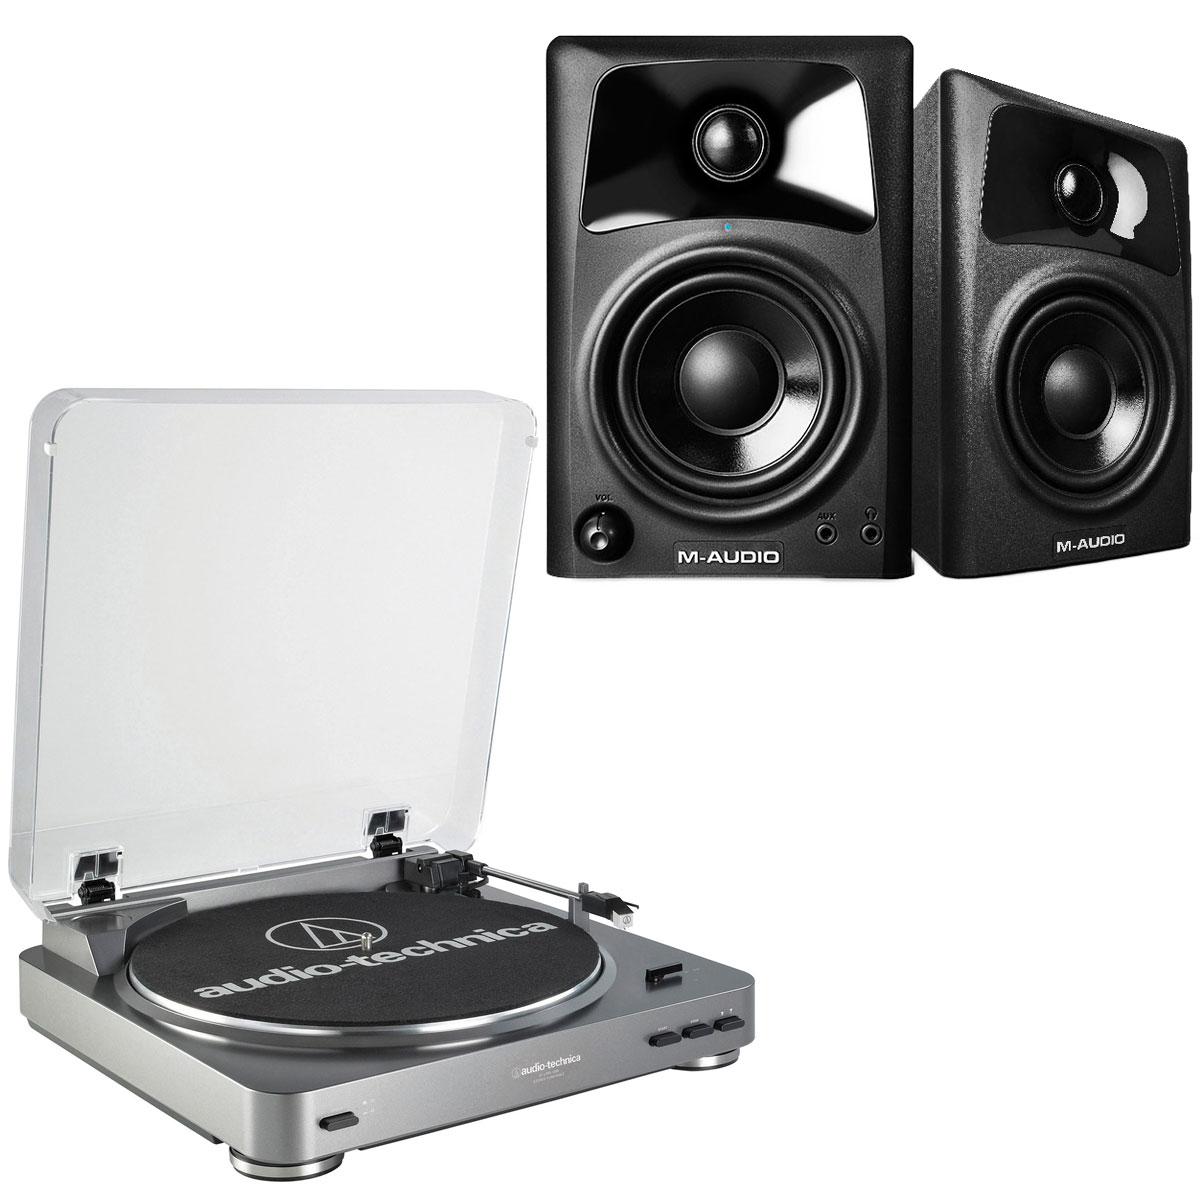 Platine vinyle Audio-Technica AT-LP60USB + M-Audio AV 42 Platine vinyle à 2 vitesses (33-45 trs/min) + Enceintes de monitoring actives 2.0